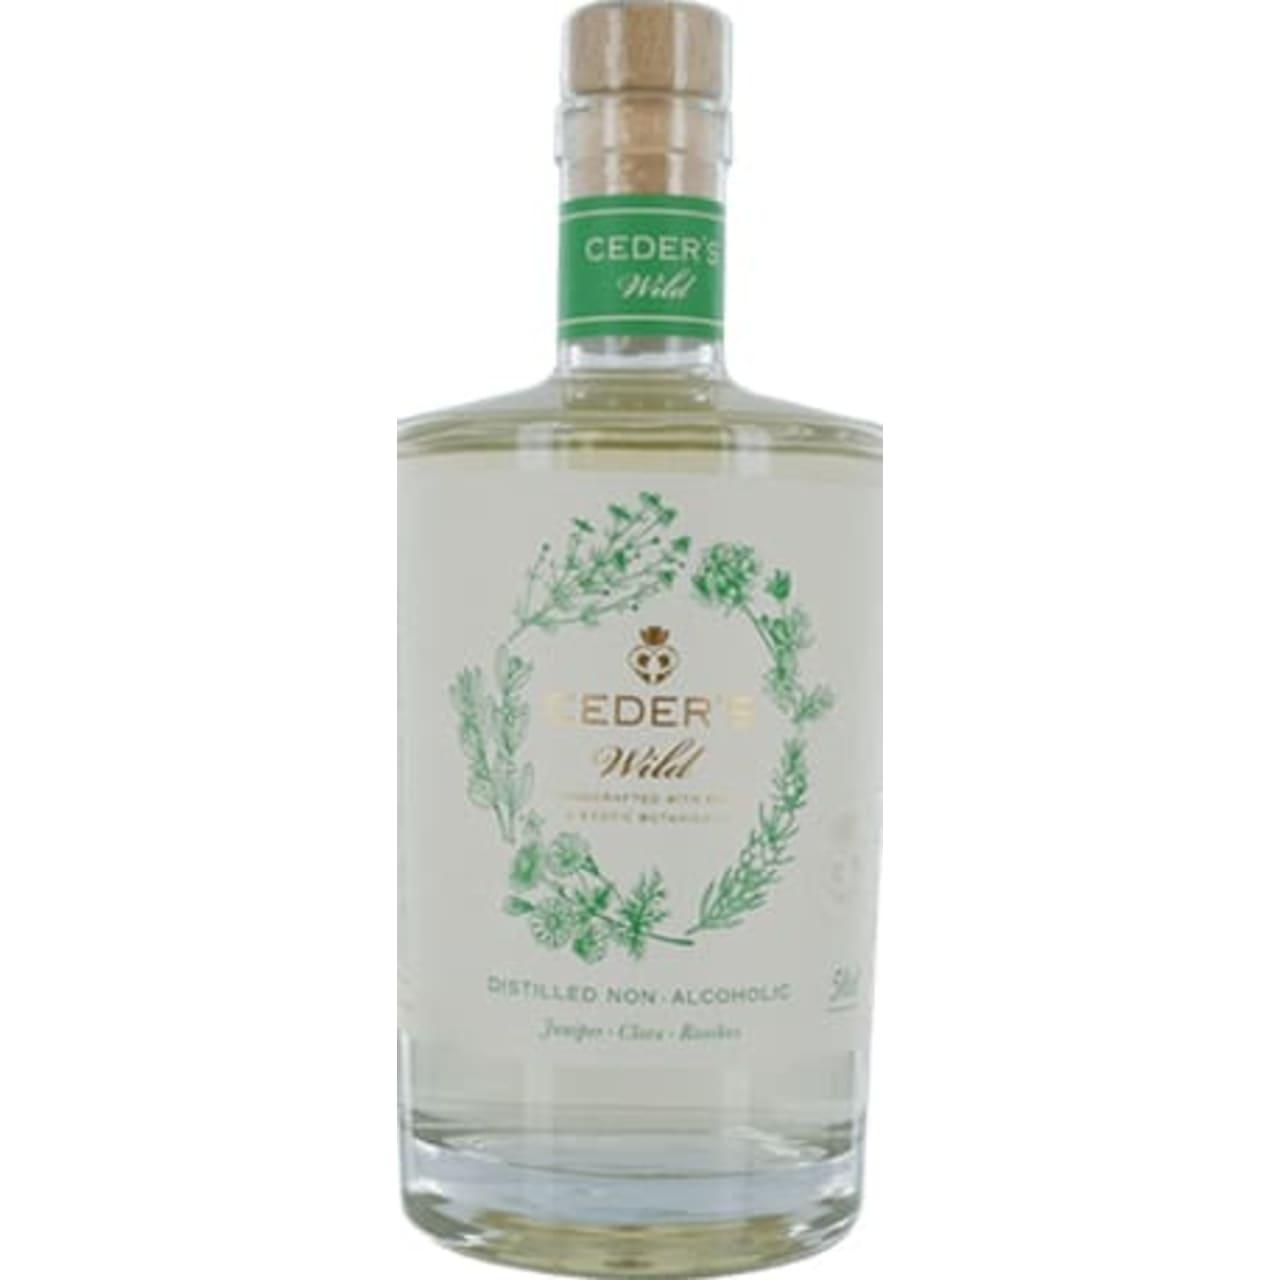 Product Image - Ceder's Wild Non Alcoholic Spirit